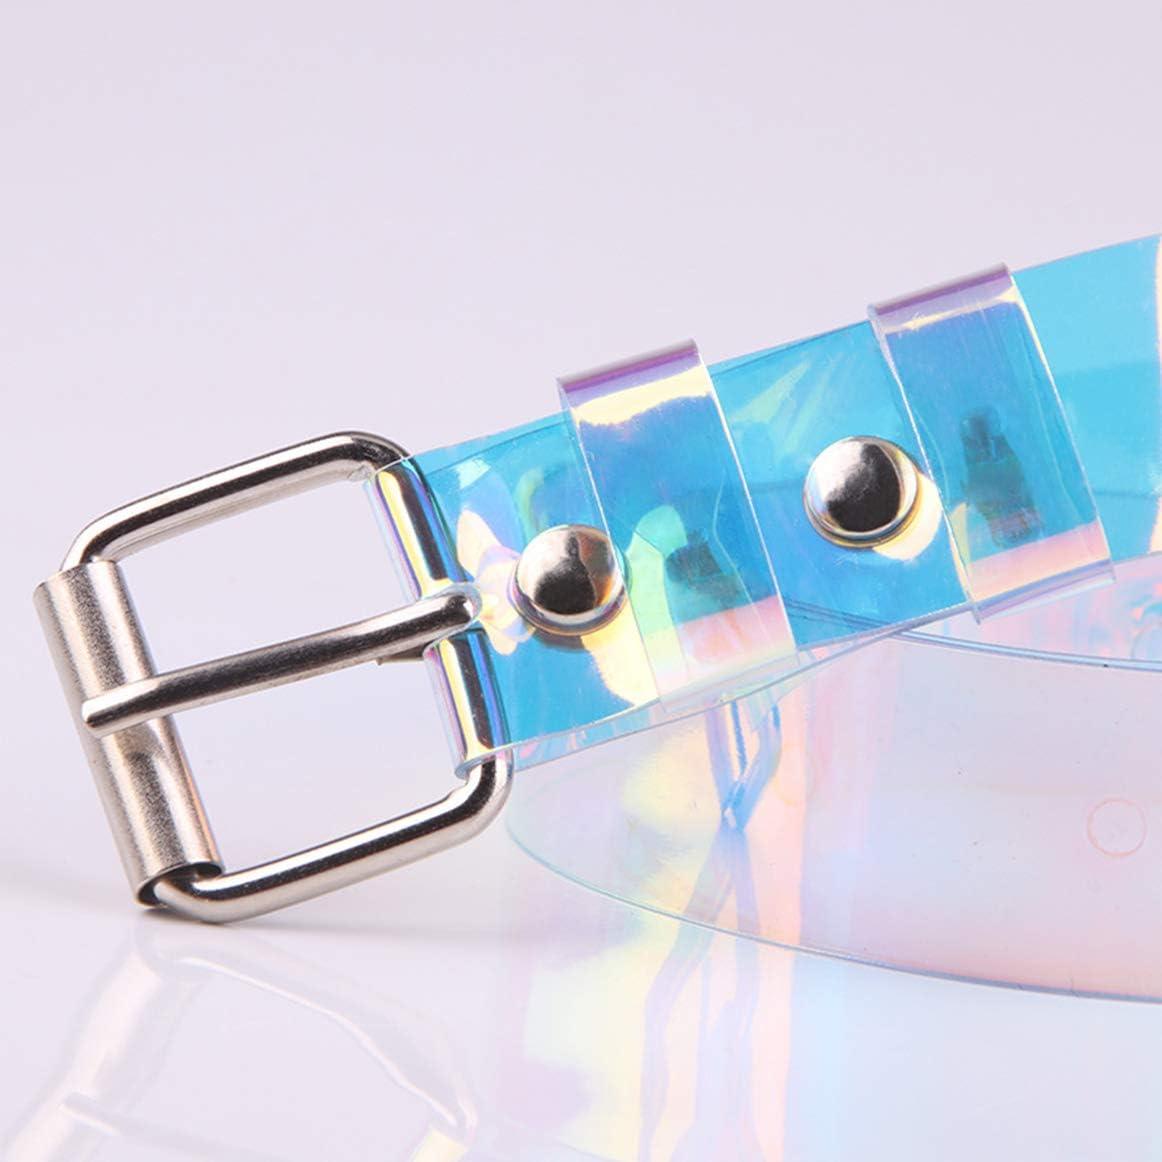 Womens Belts PVC-Grommet-Holographic-Clear Pin-Bucket Waist-Belt 90cm length//35inch,Rainbow